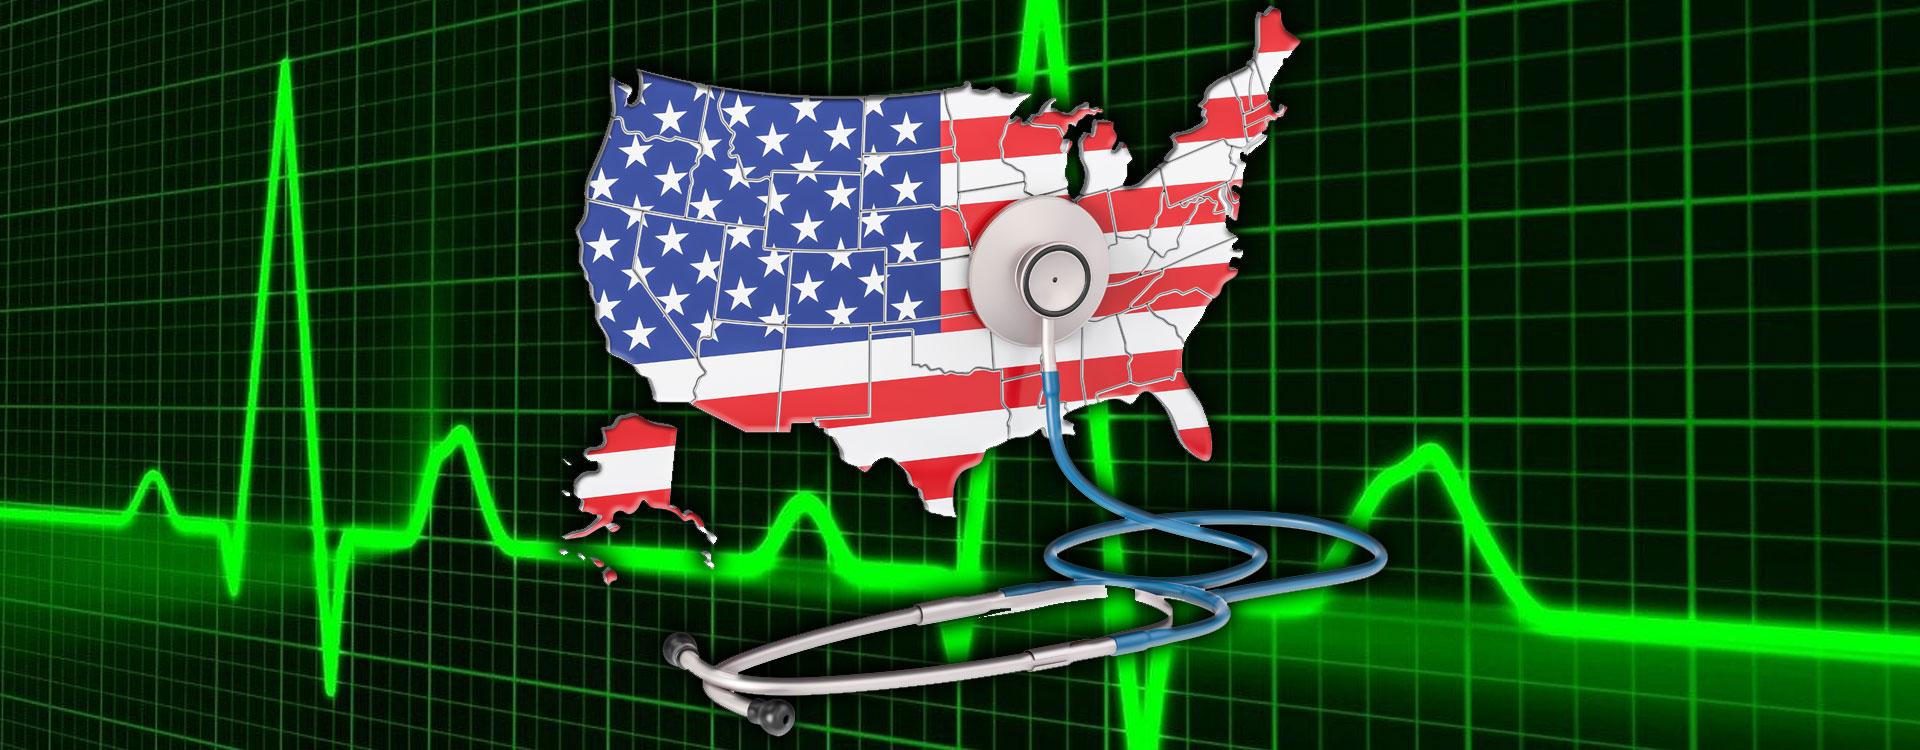 stethoscope taking america's pulse